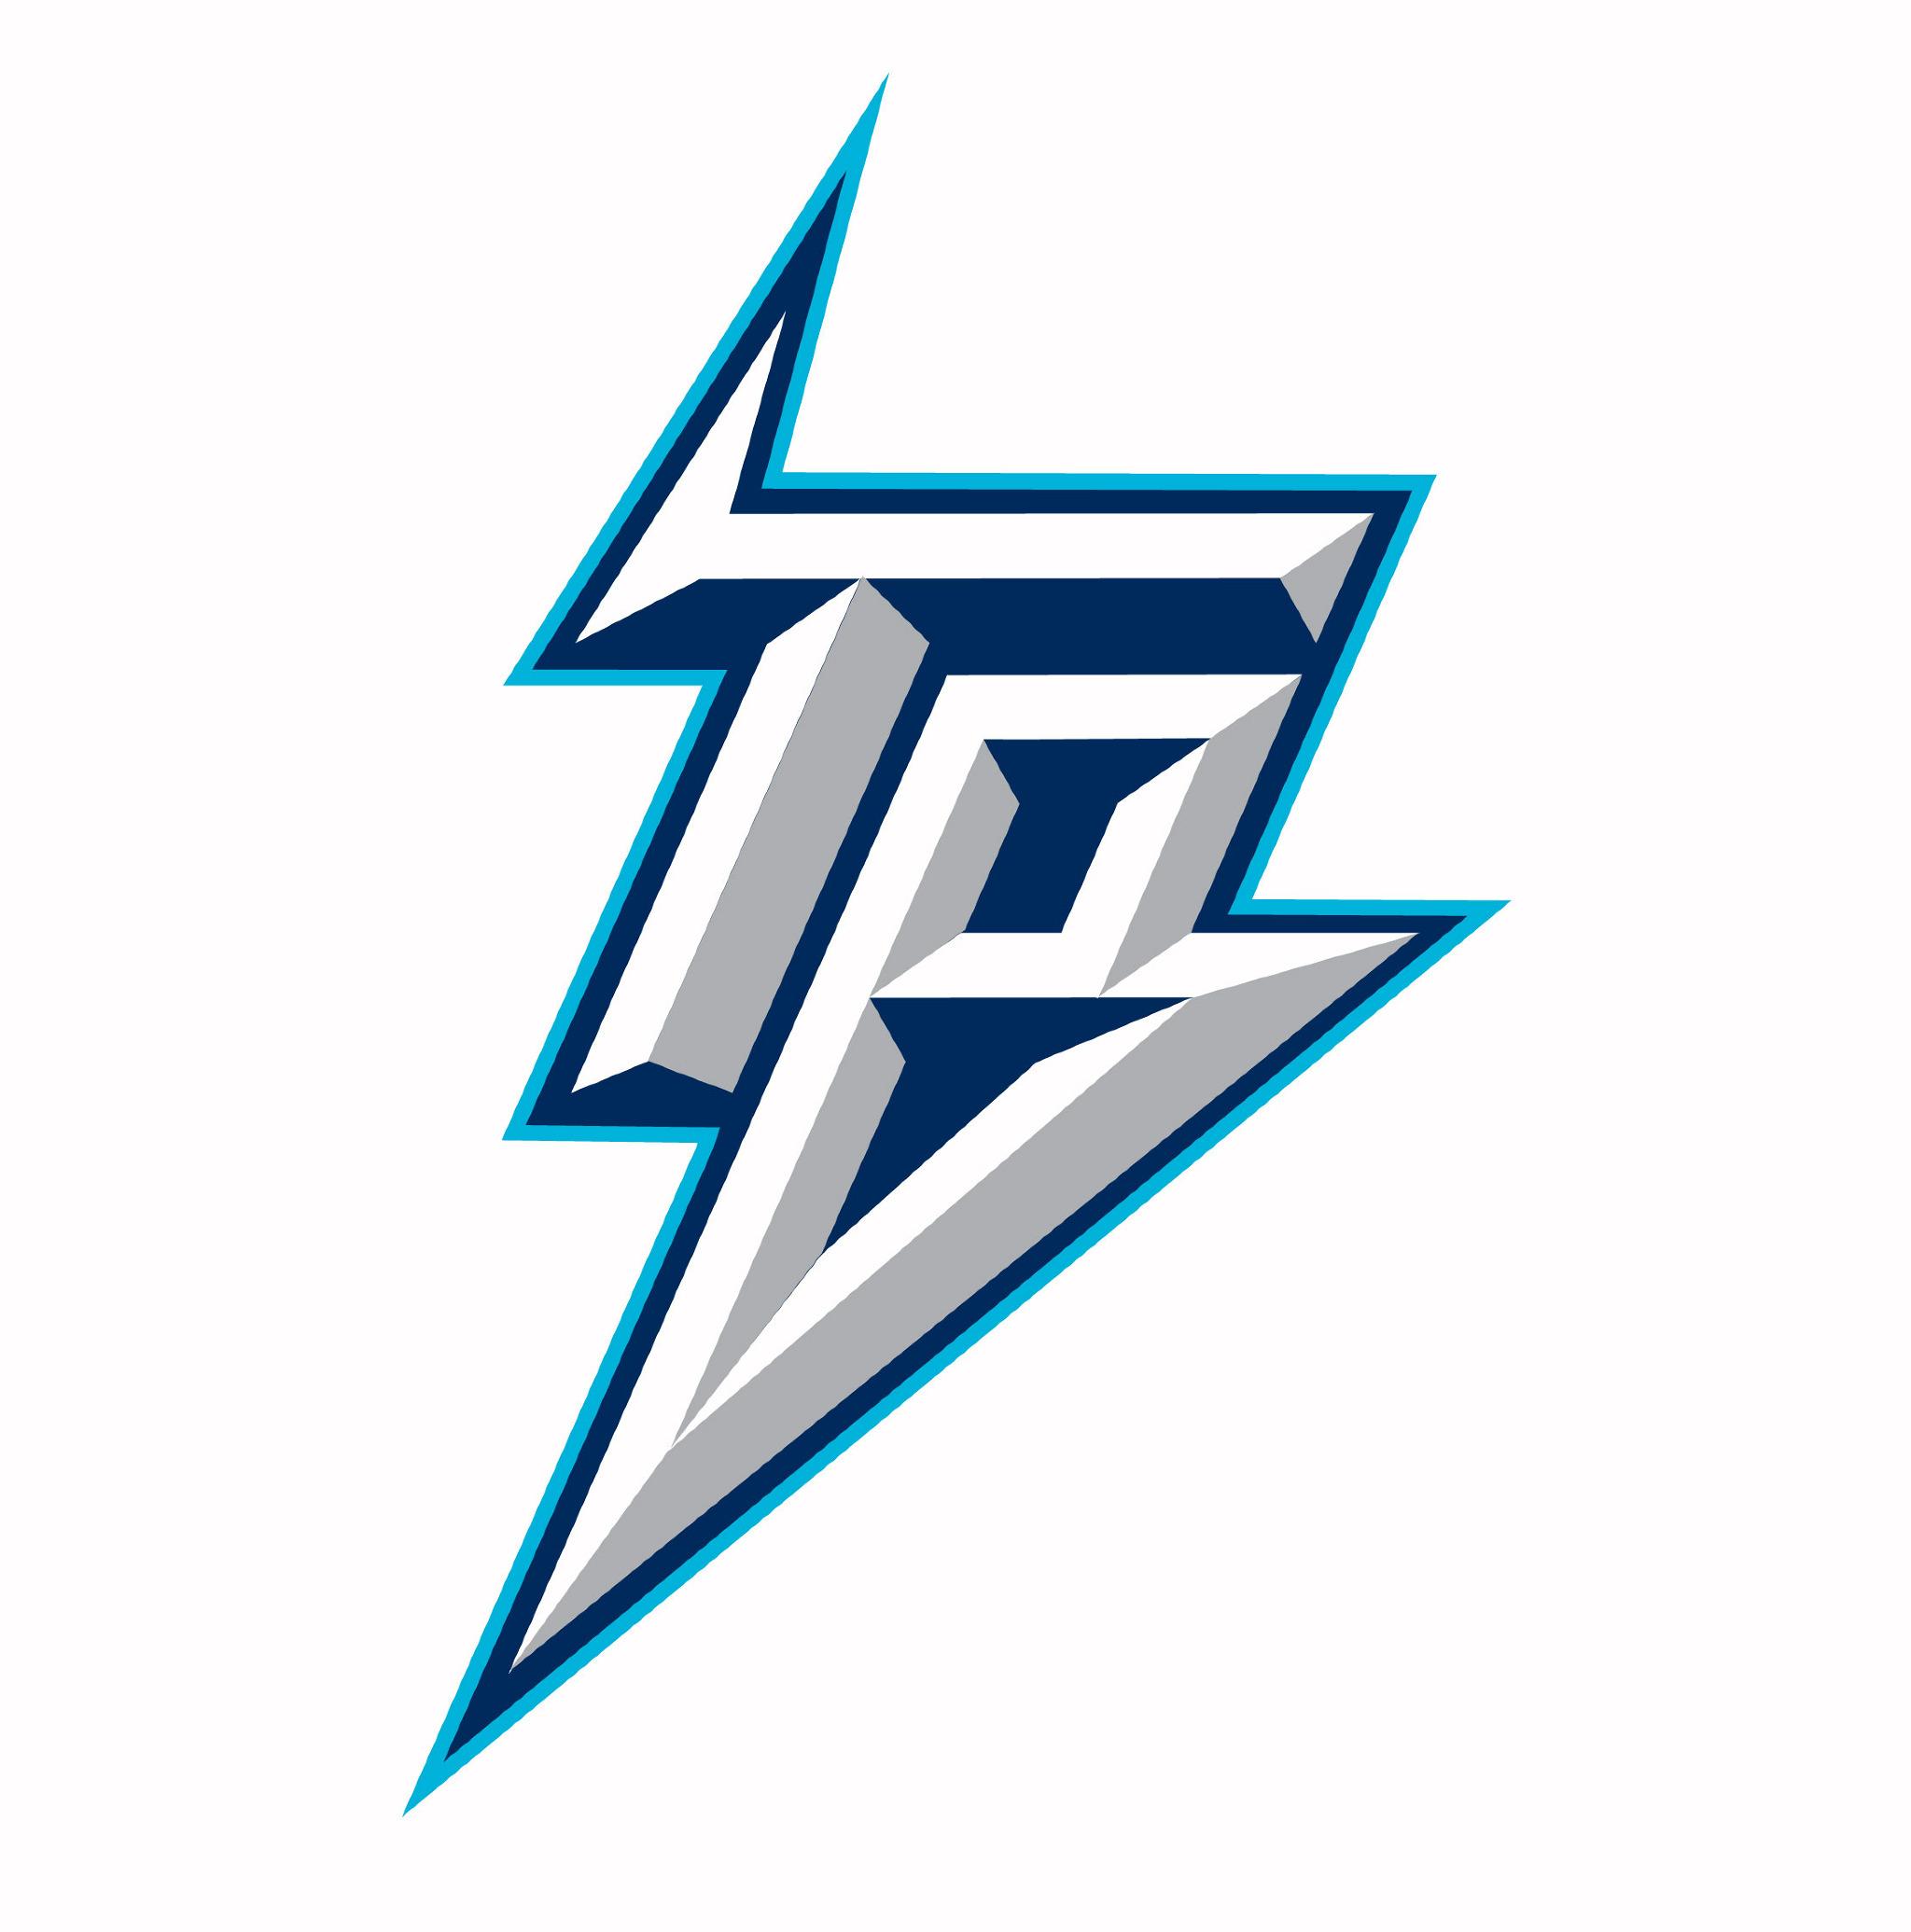 Tampa Bay Lightning Rebrand - Shannon Hartmark